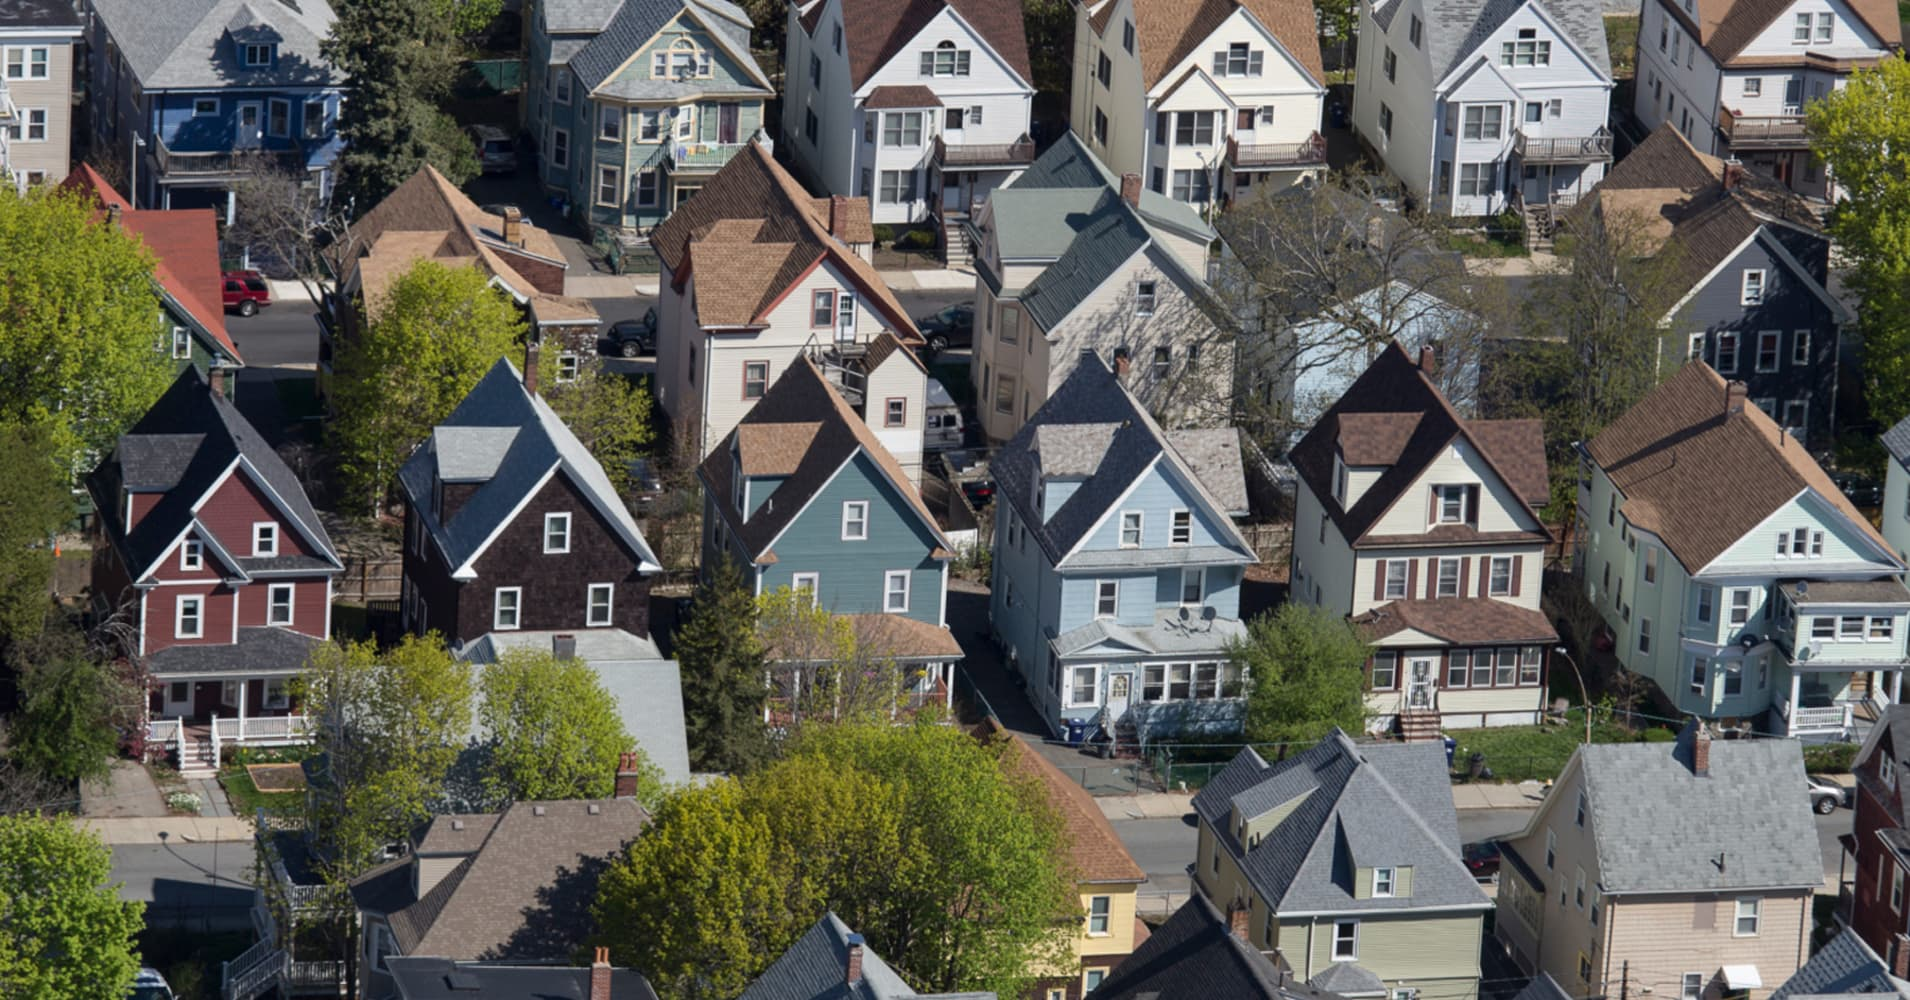 Three-decker houses in Dorchester, MA.